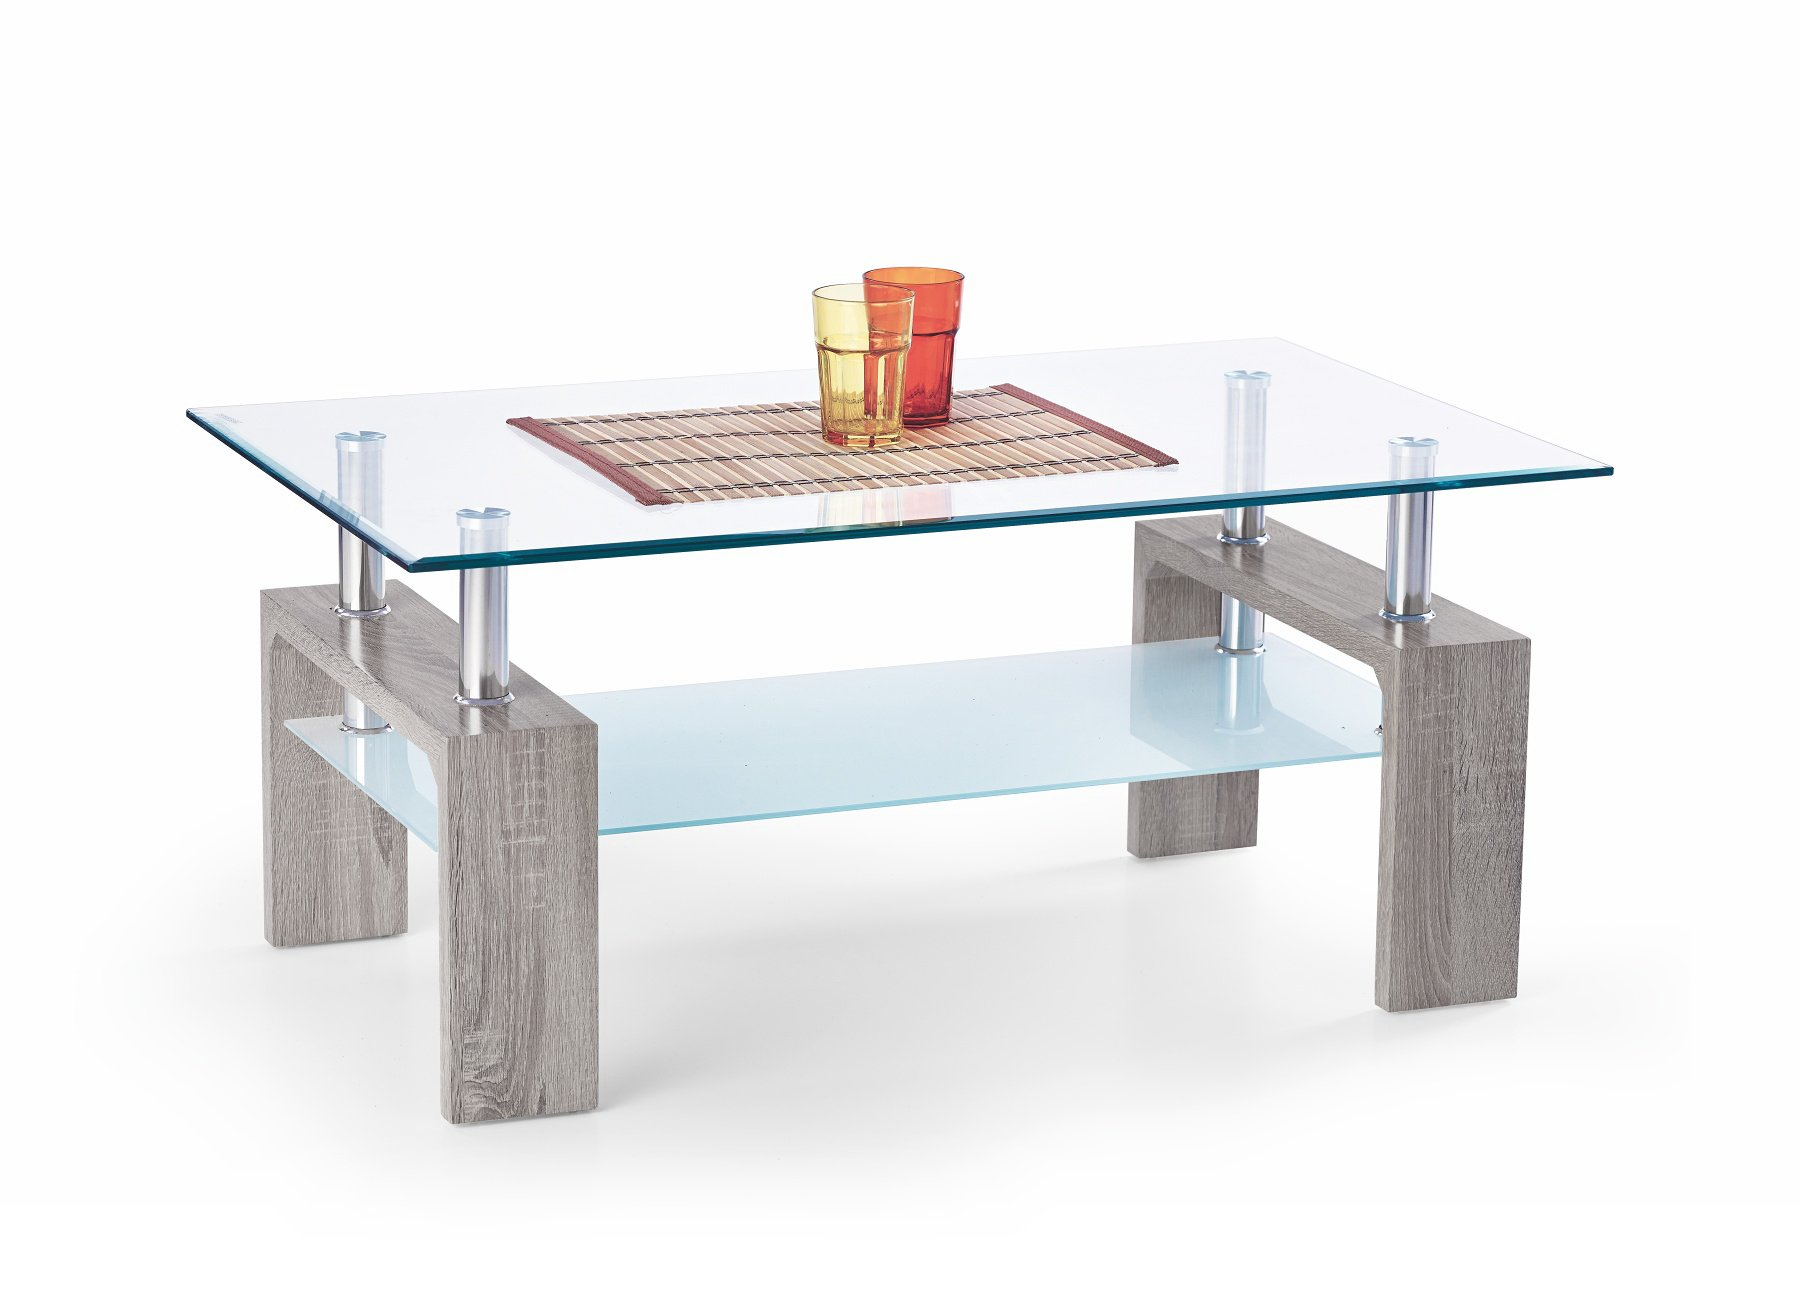 Konferenční stolek - Halmar - Diana Intro (dub sonoma tmavý)